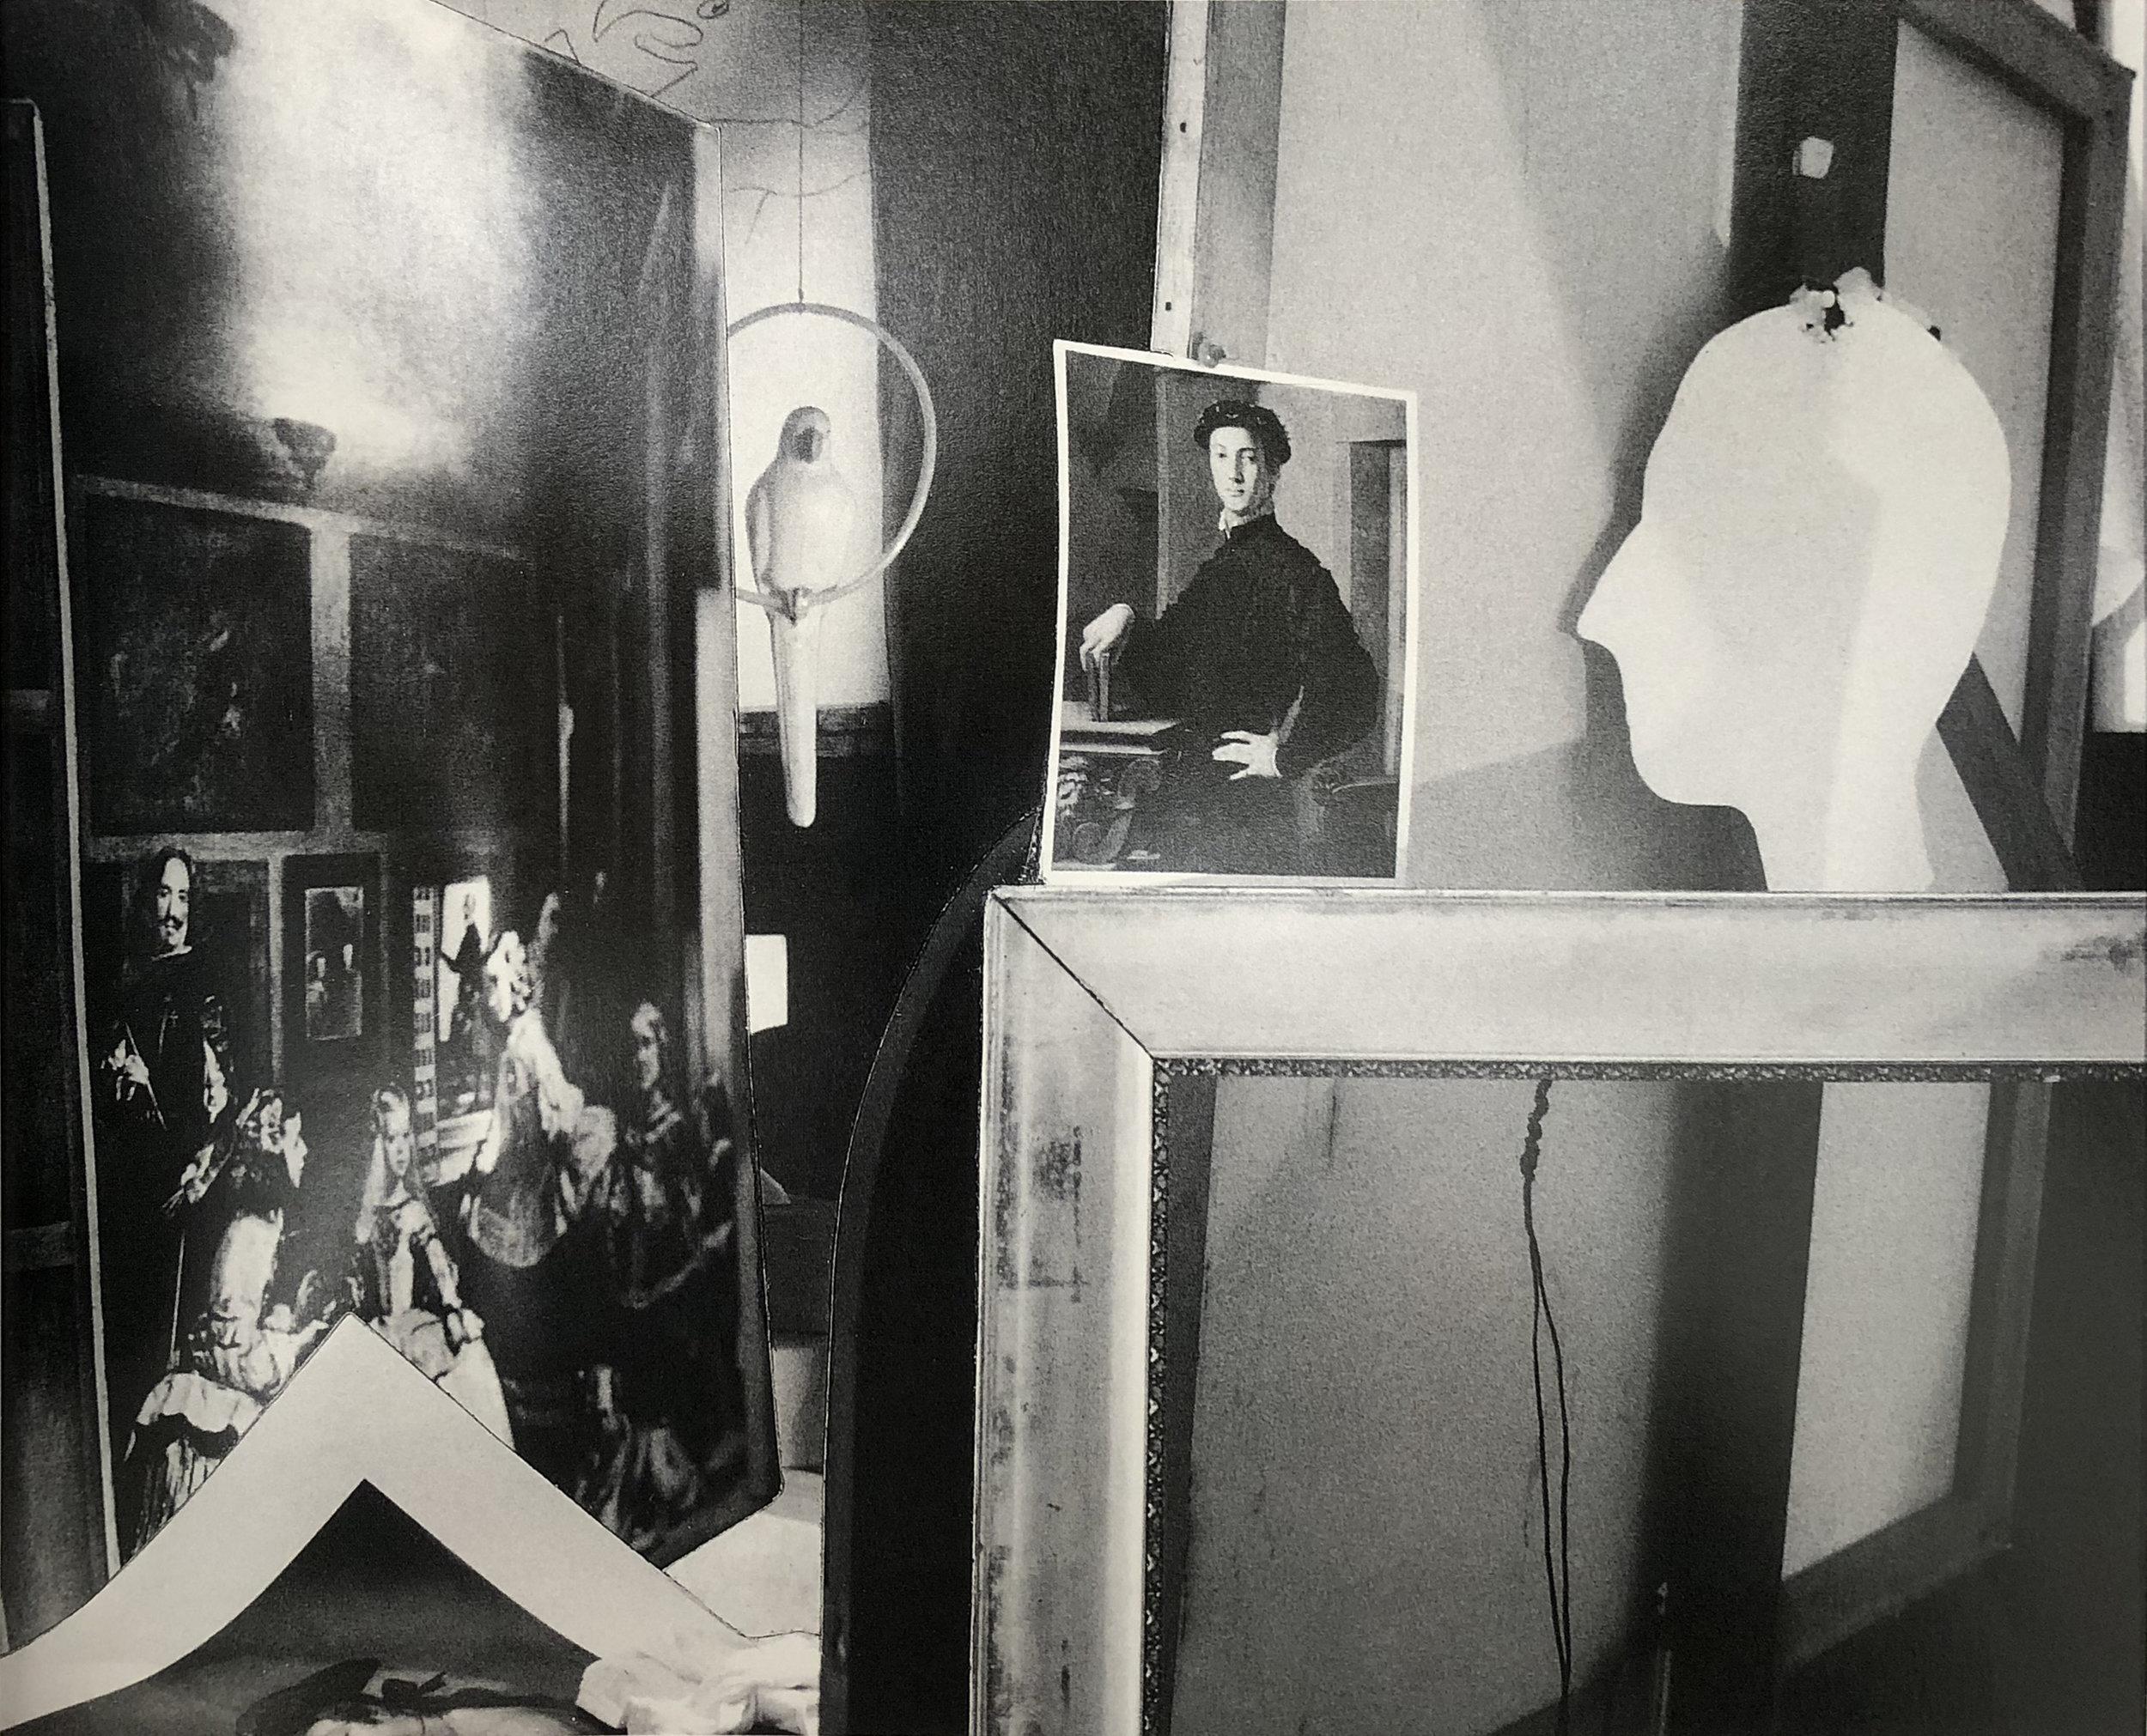 John O'Reilly  A Paper Self , 1986  polaroid montage  3.69h x 4.56w in